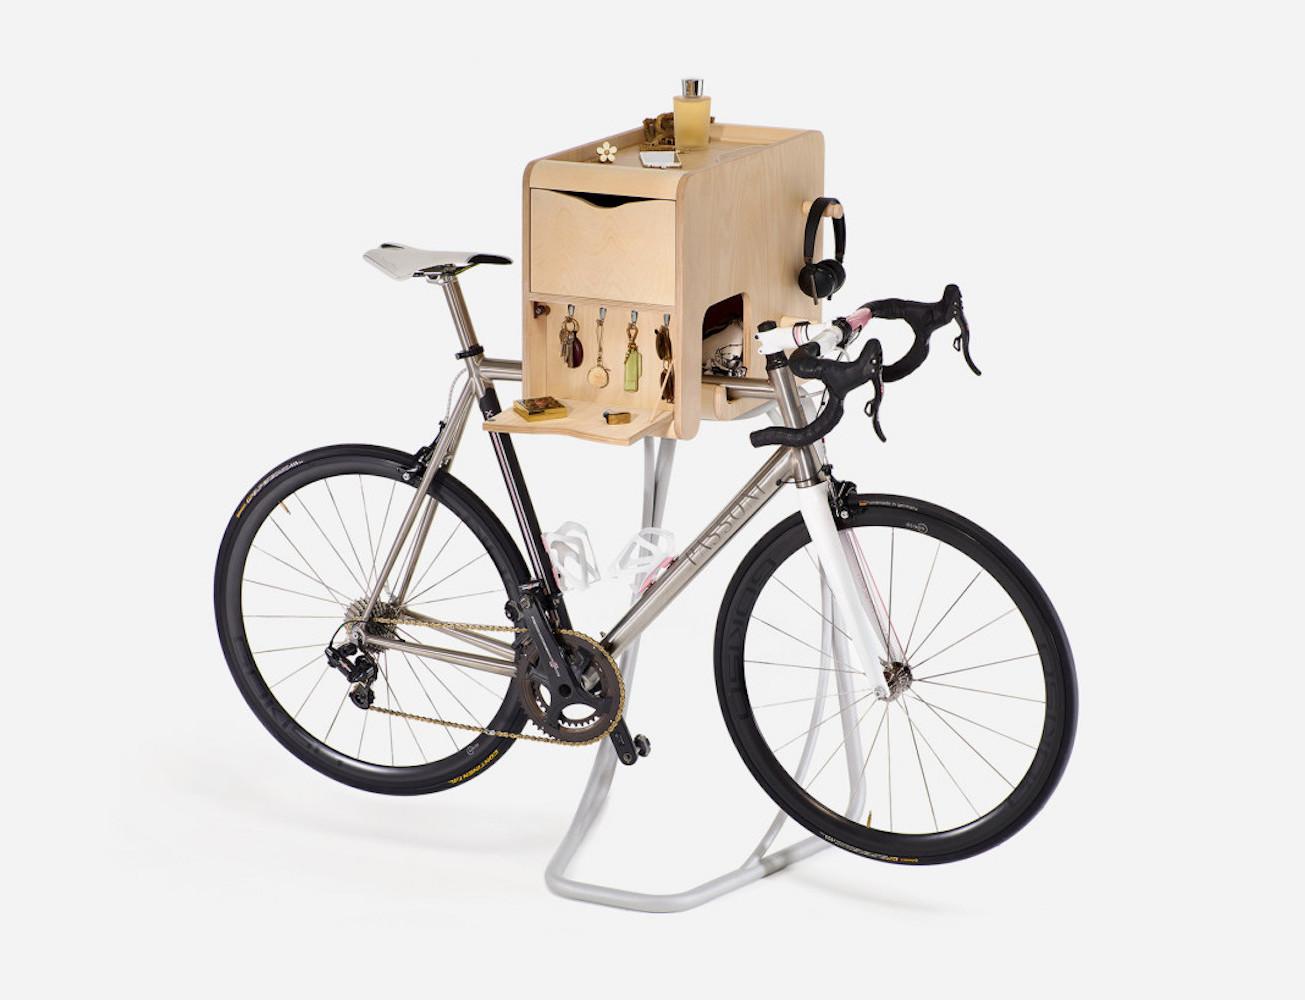 bike-butler-the-smartest-bike-stand-ever-04